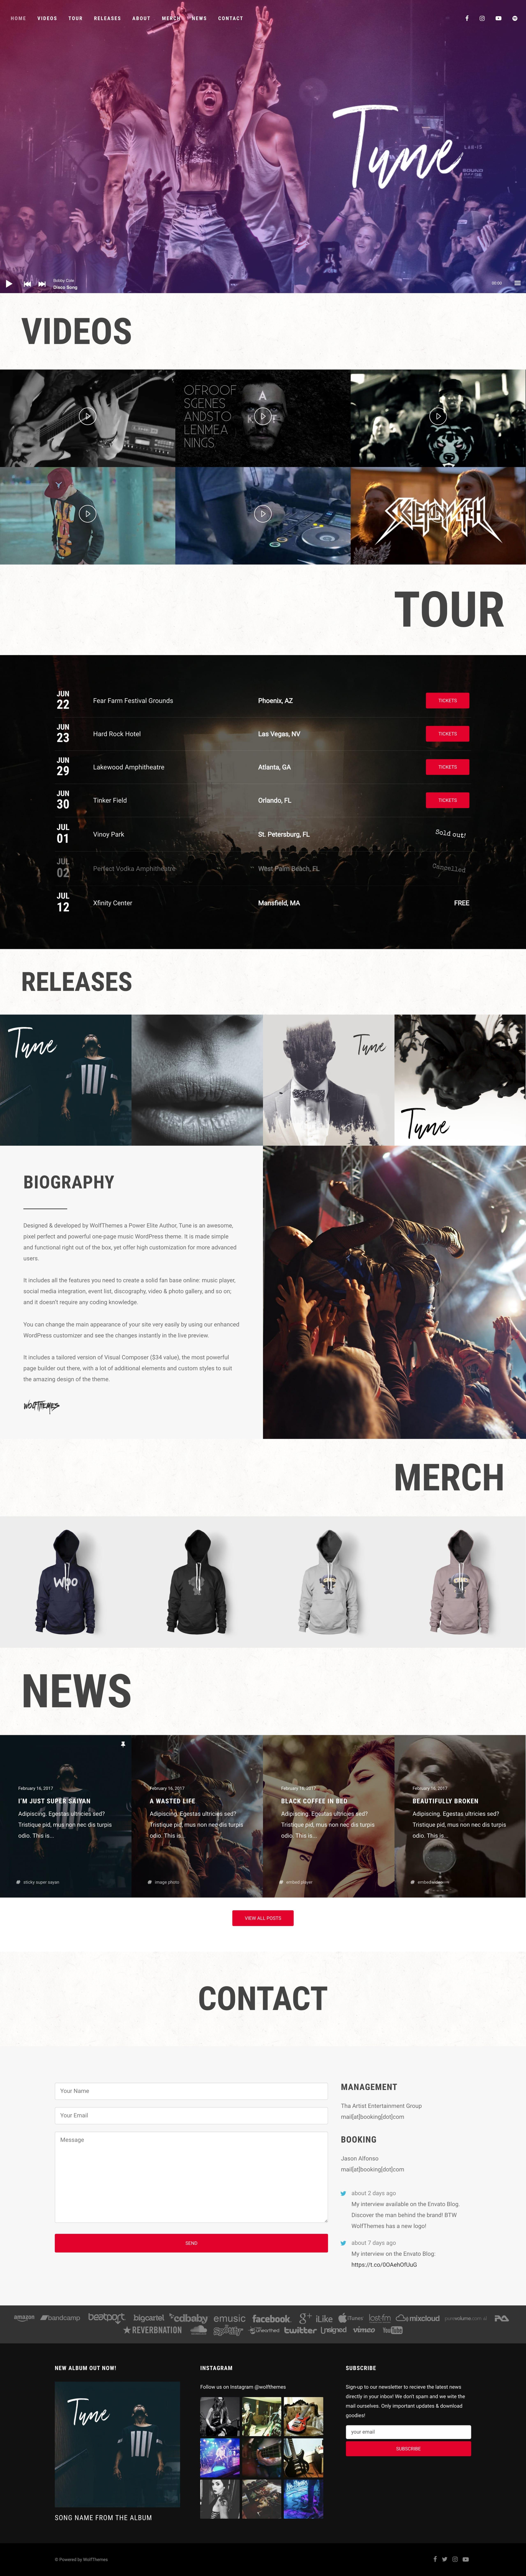 Tune Website Screenshot